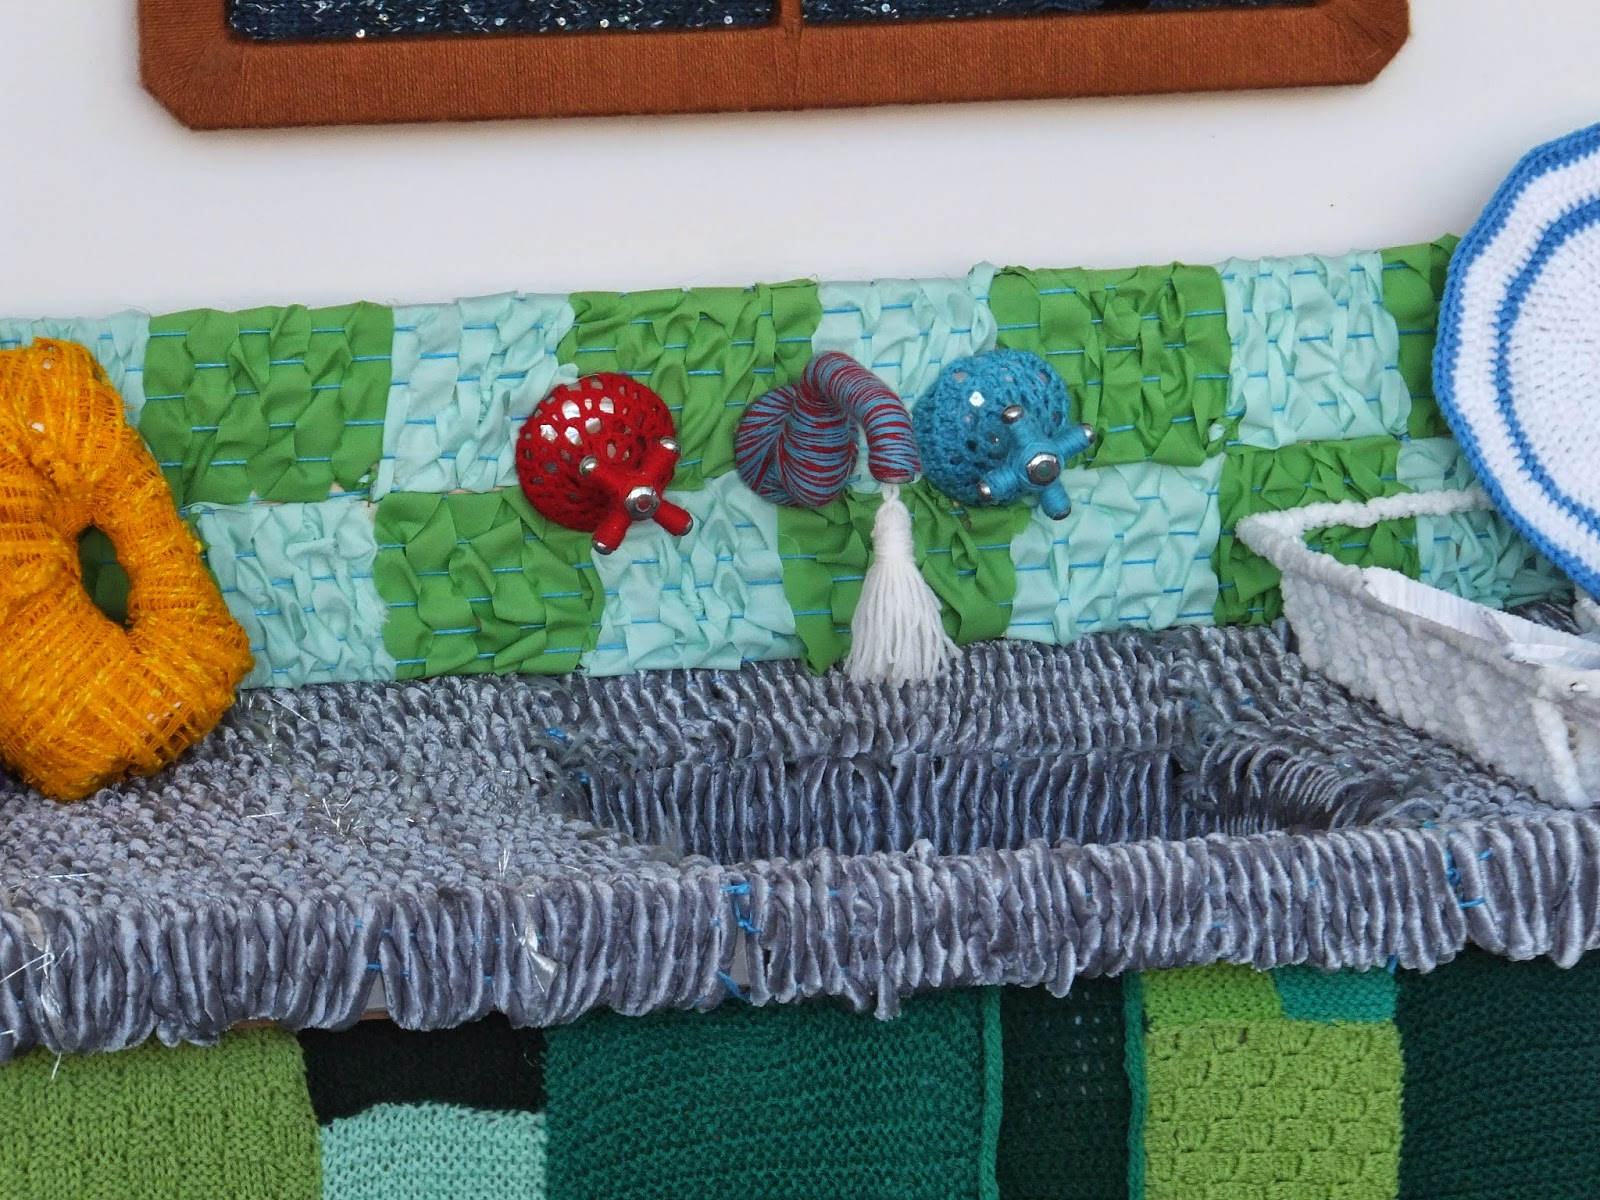 yarn-bombing-warwick-art-gallery-08